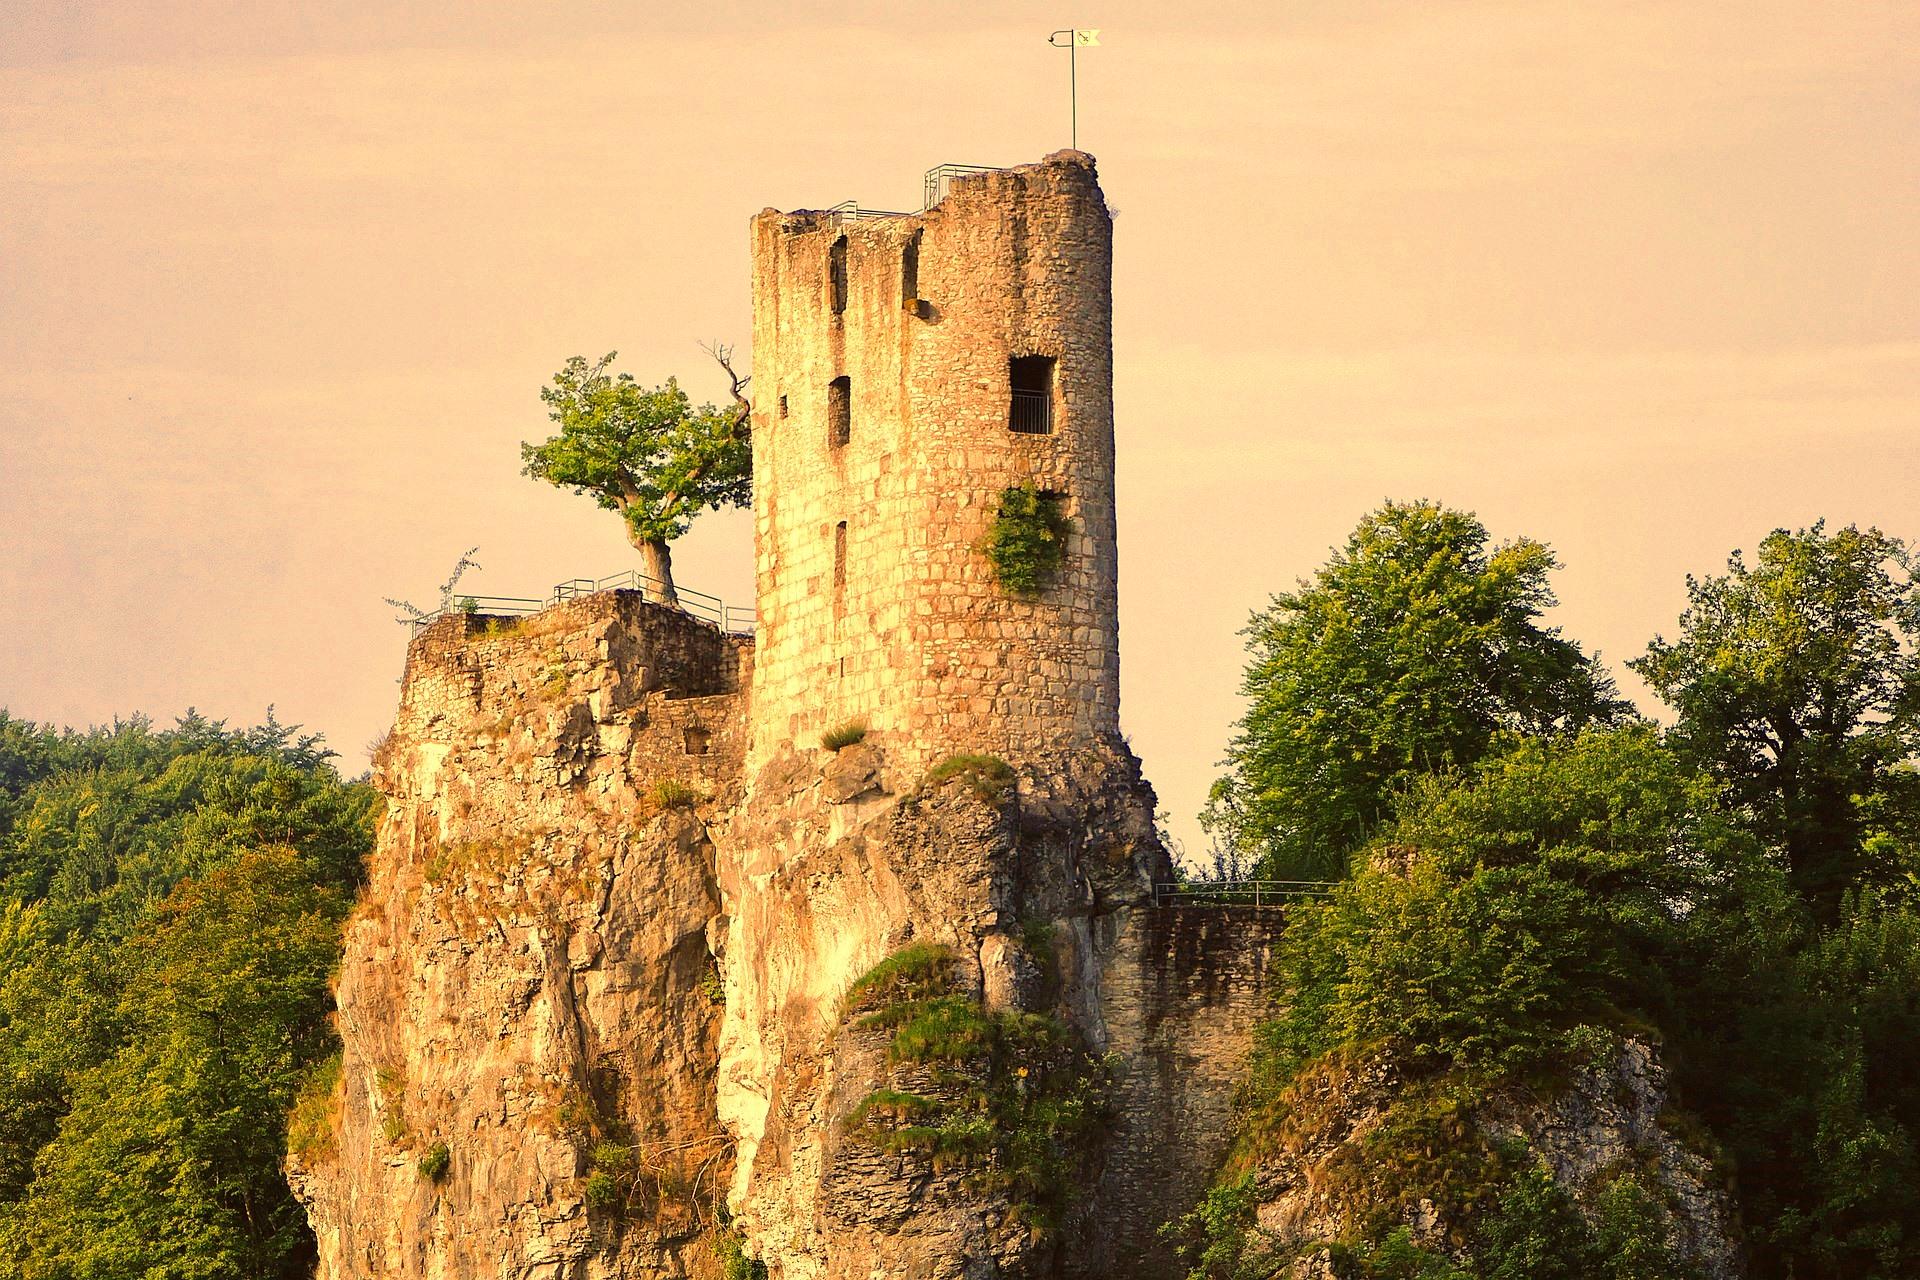 Burgruine Ruine Turm Sage